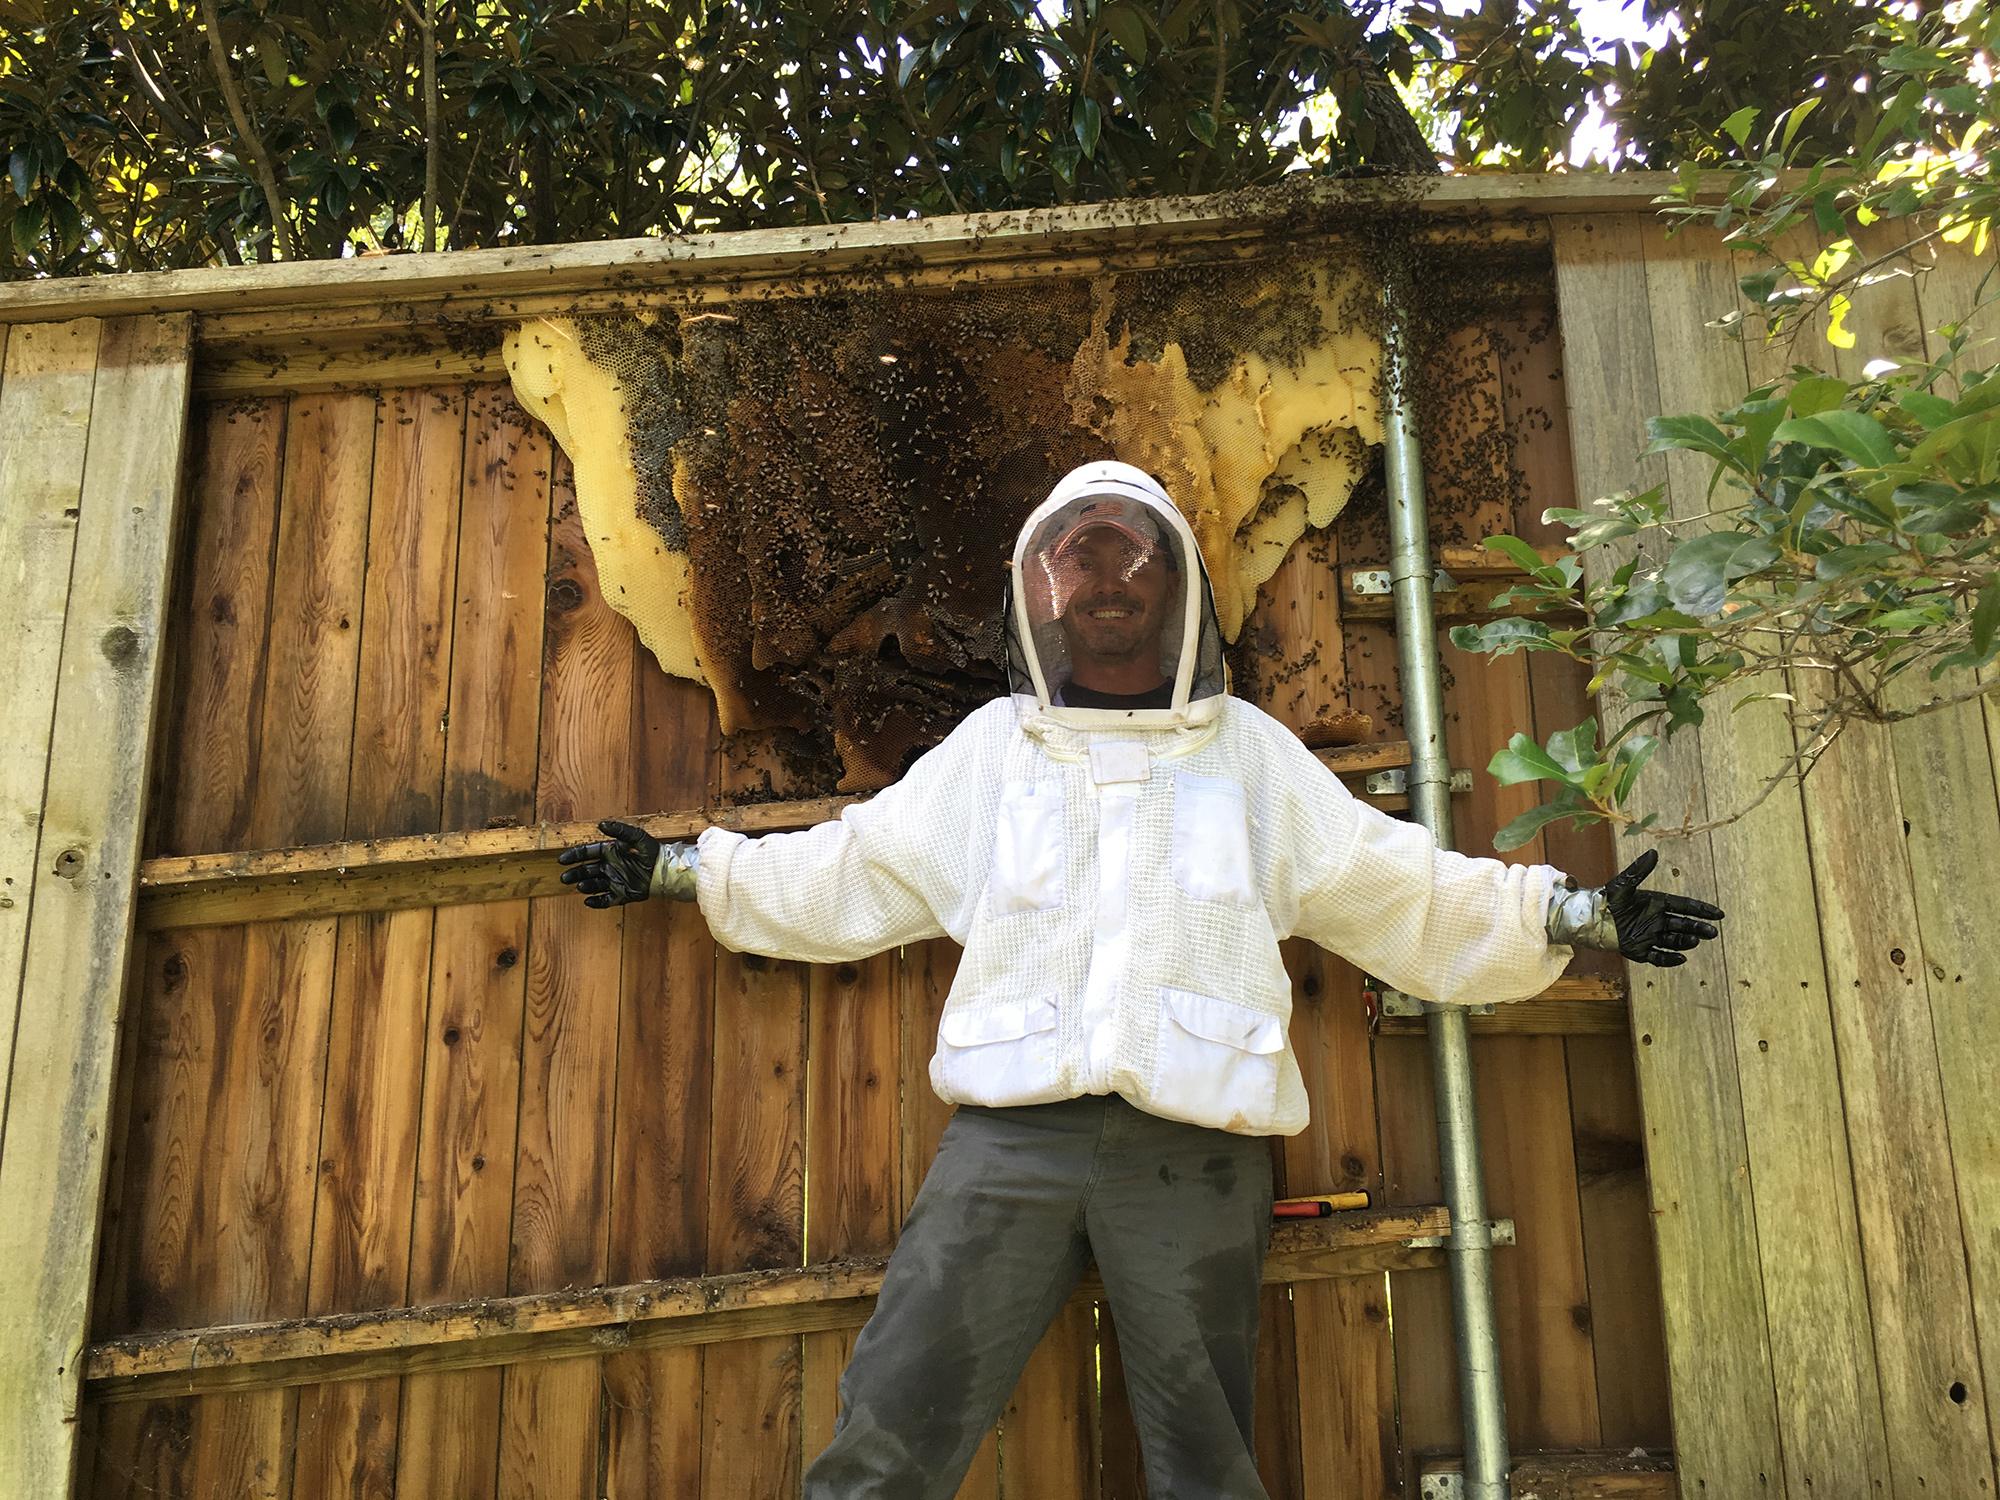 Live Honey Bee Removals – JC's Honey Bees